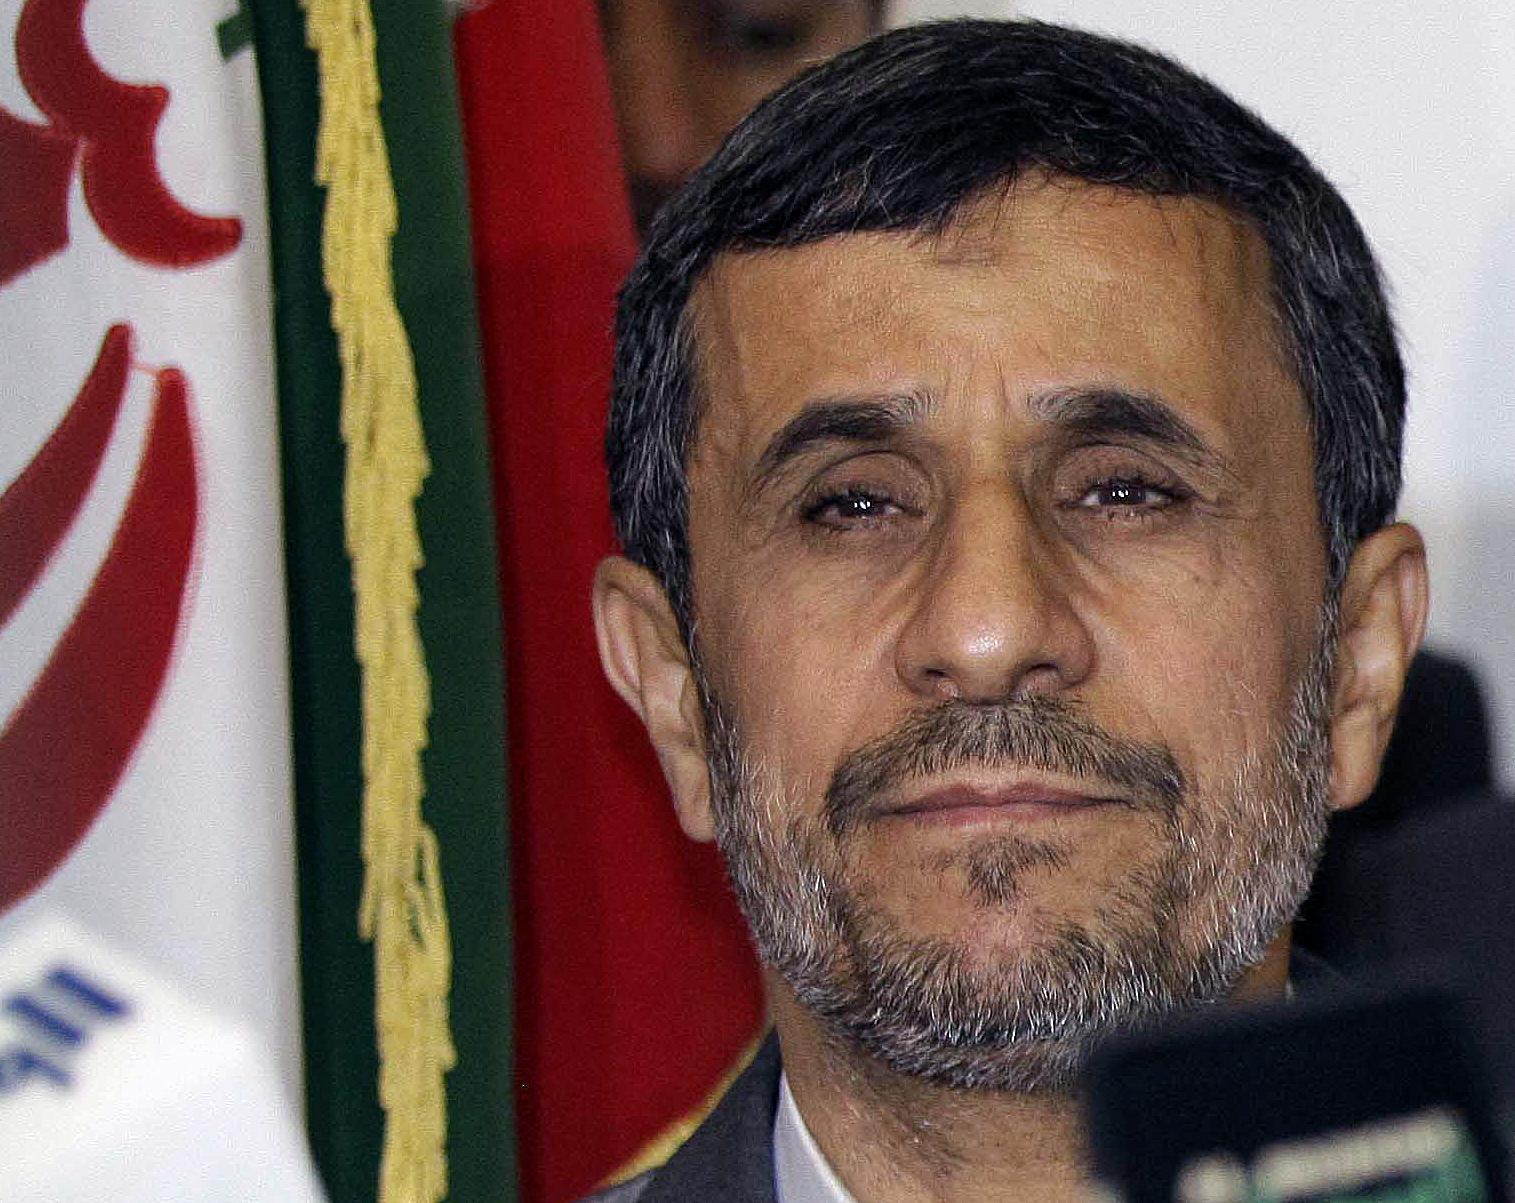 Iran's President Mahmoud Ahmadinejad listens to a question during a joint news conference with Najaf governor Adnan al-Zurufi in Najaf, Iraq, July 19, 2013. REUTERS/Karim Kadim/Pool